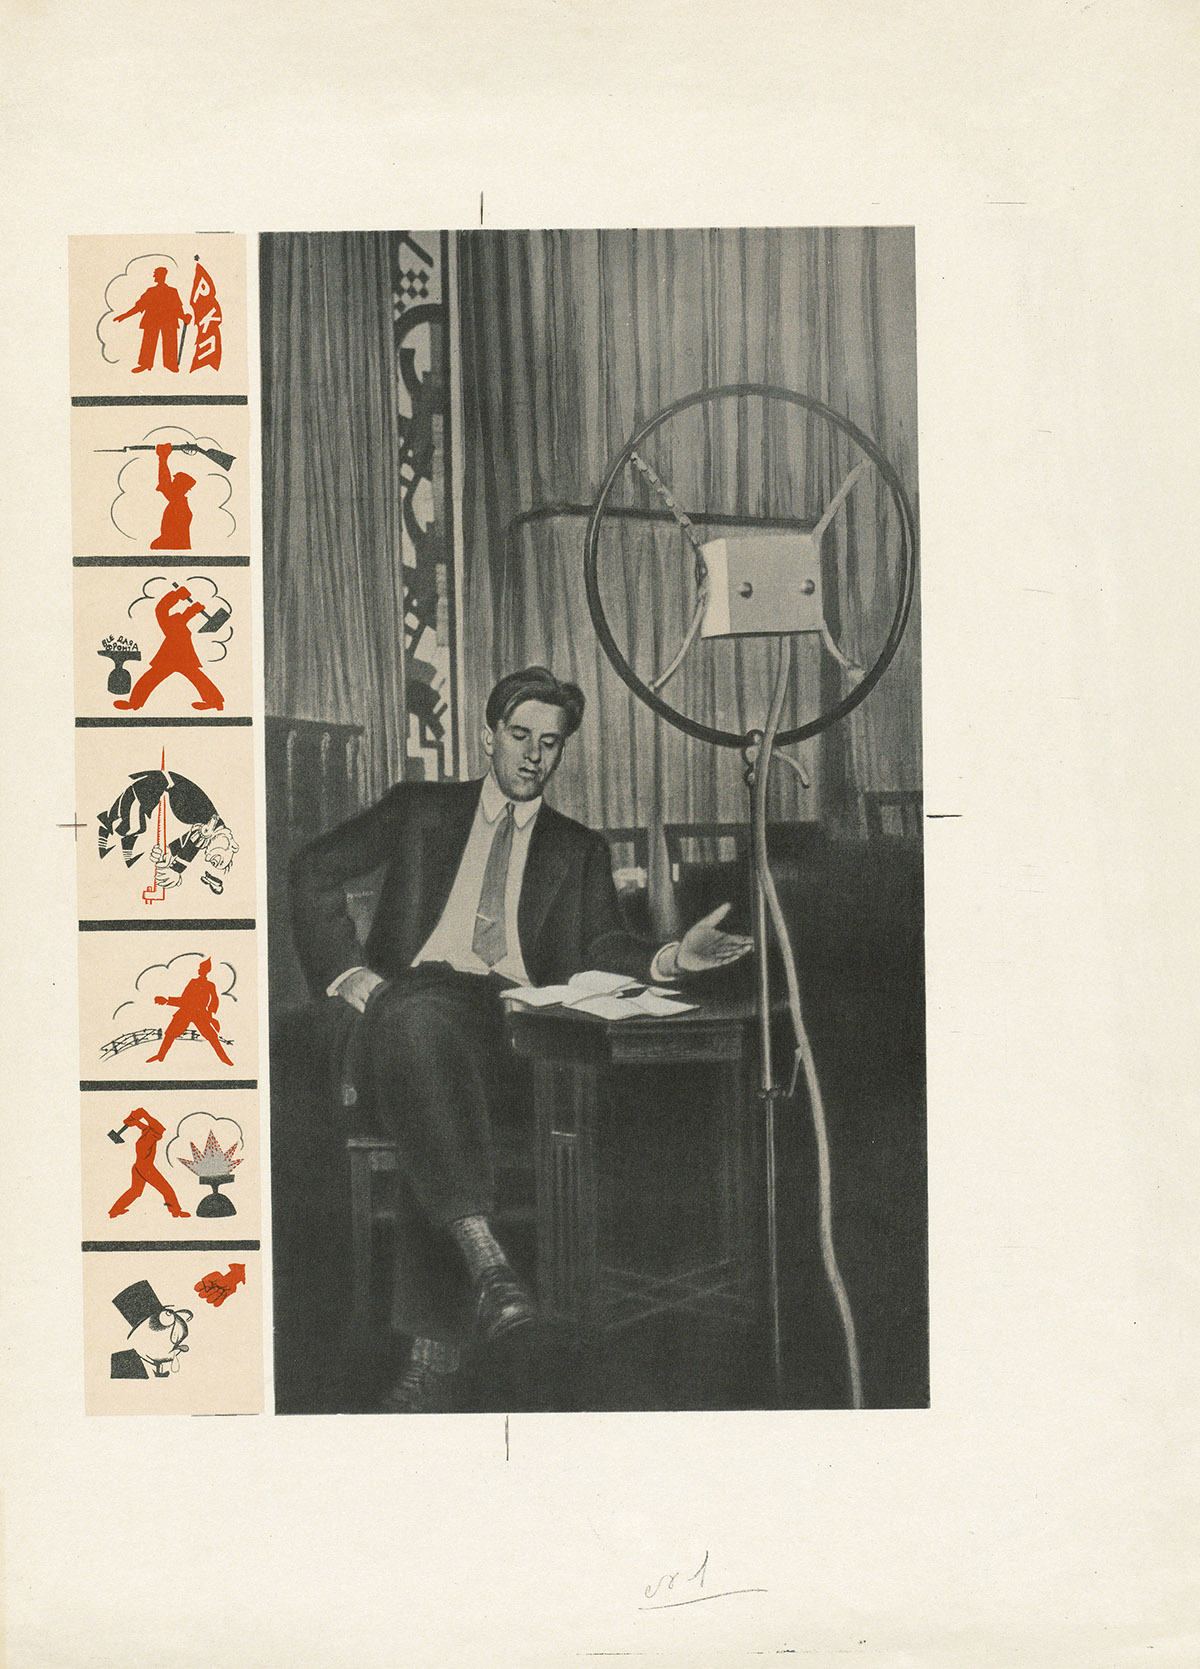 ALEXANDER RODCHENKO (1891-1956) & VAVARA STEPANOVA (1894-1958). [USSR IN CONSTRUCTION / MAYAKOVSKY / BANIA.] Uncut proof before lette